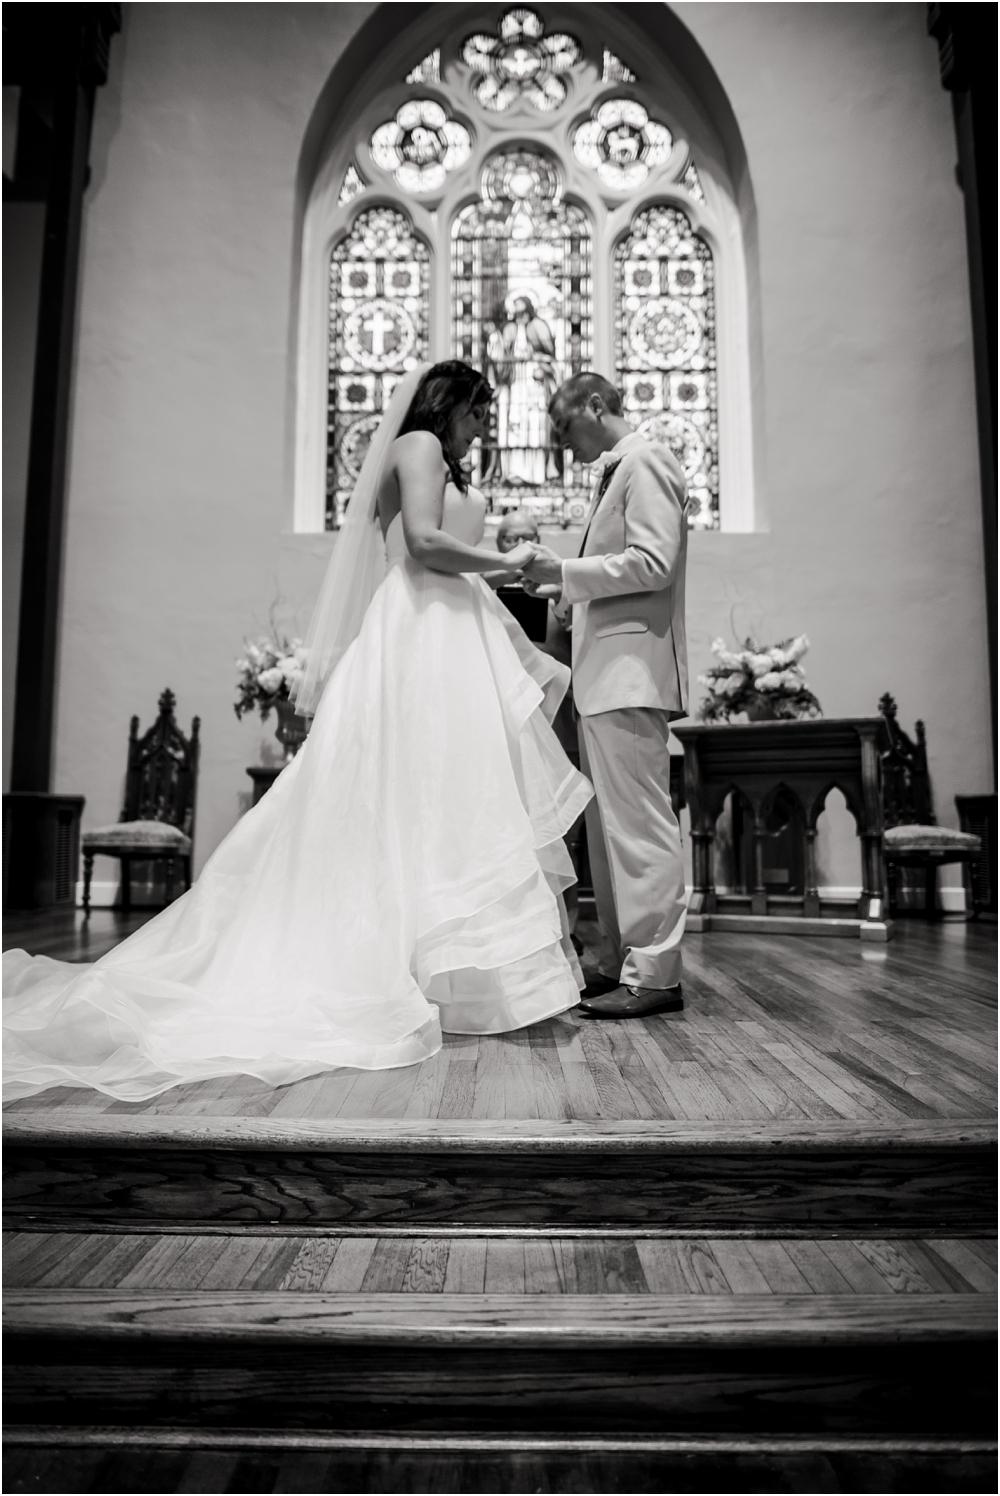 pensacola-wedding-photographer-kiersten-grant-95.jpg